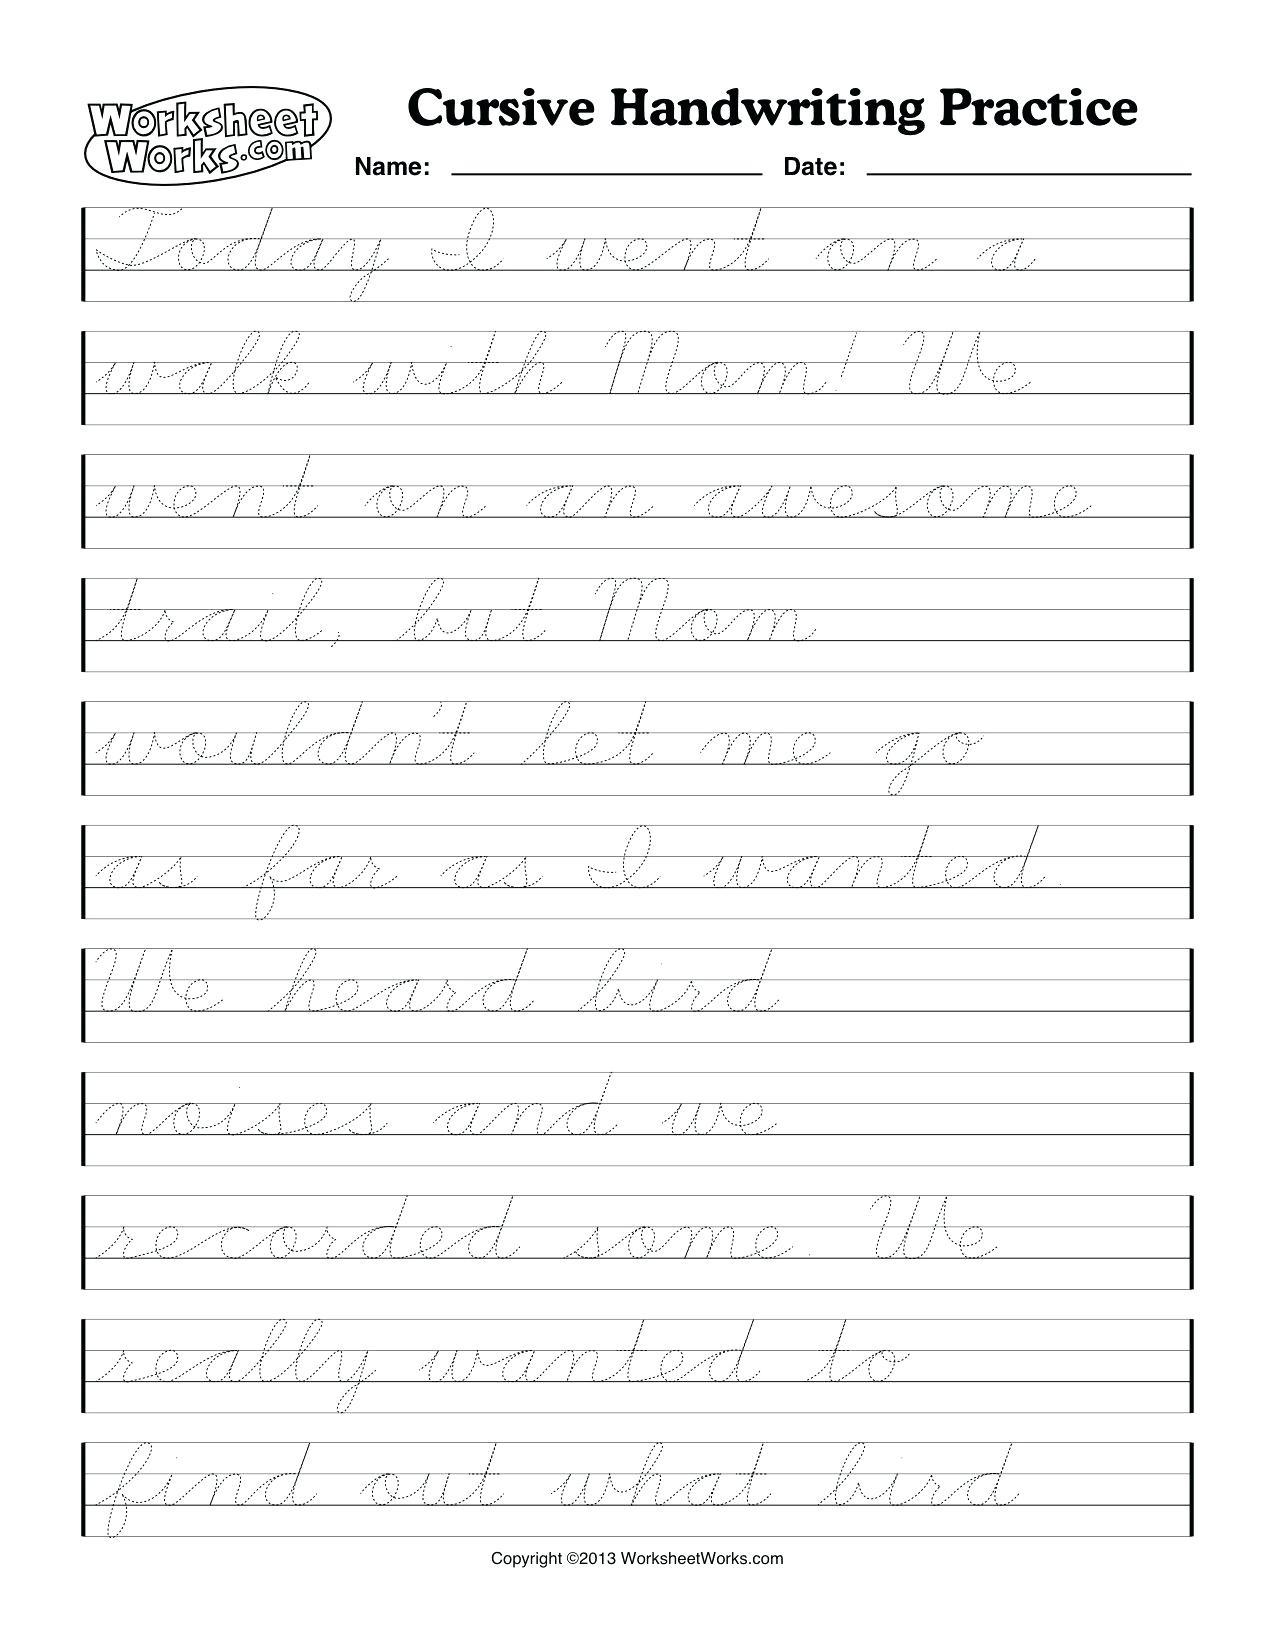 Cursive Handwriting Worksheets Free Printable Cursive